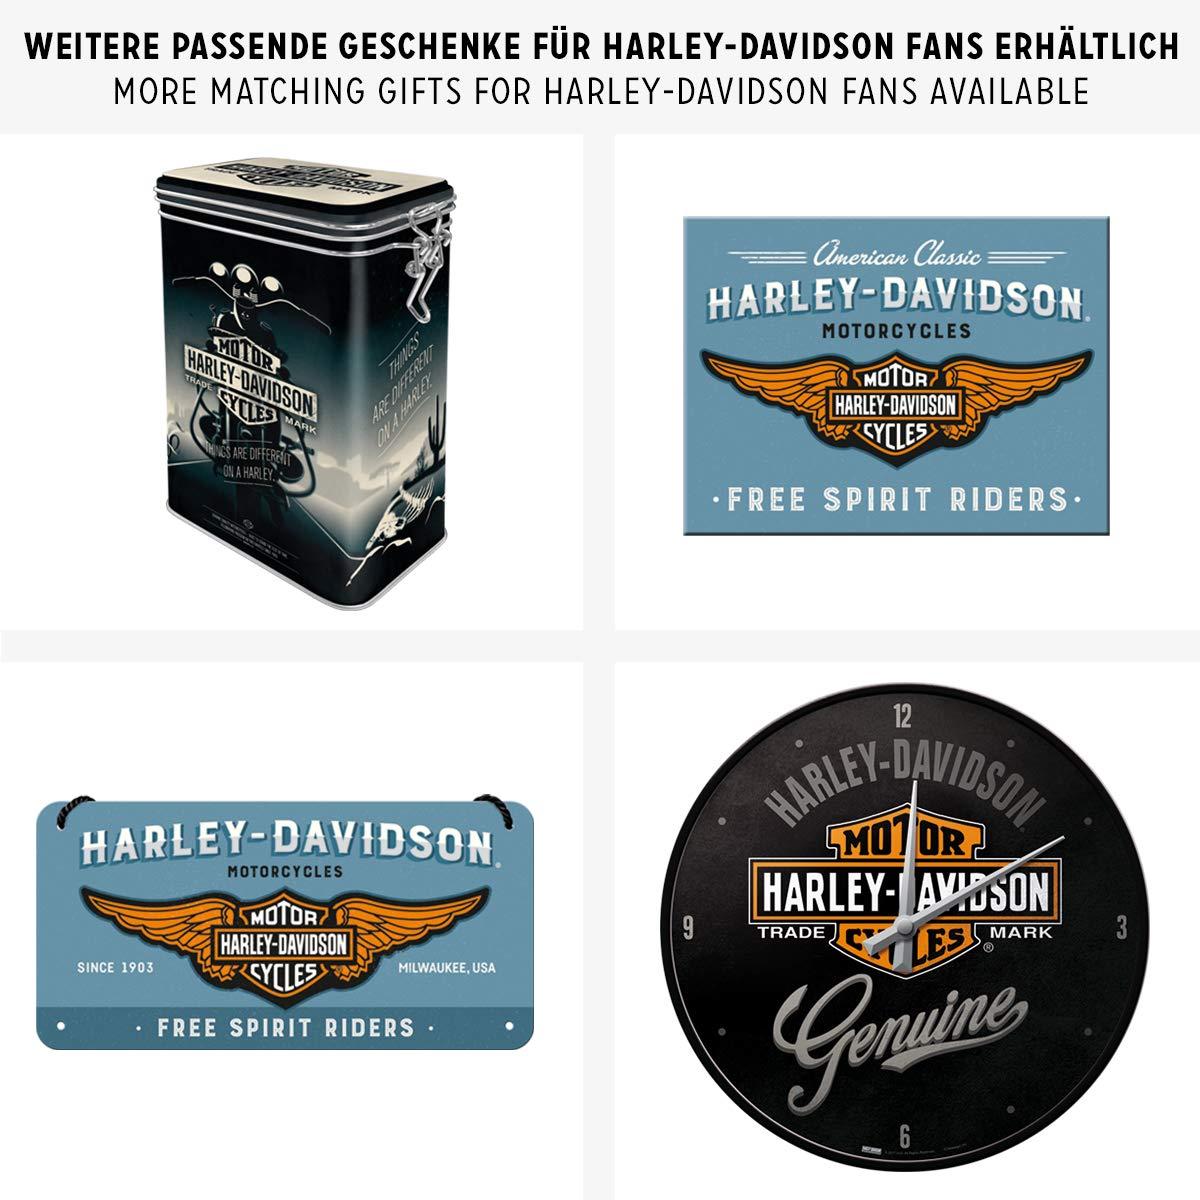 Nostalgic Art Harley Davidson Things Are Different - Placa decorativa, metal, 20 x 30 cm, color gris: Amazon.es: Hogar